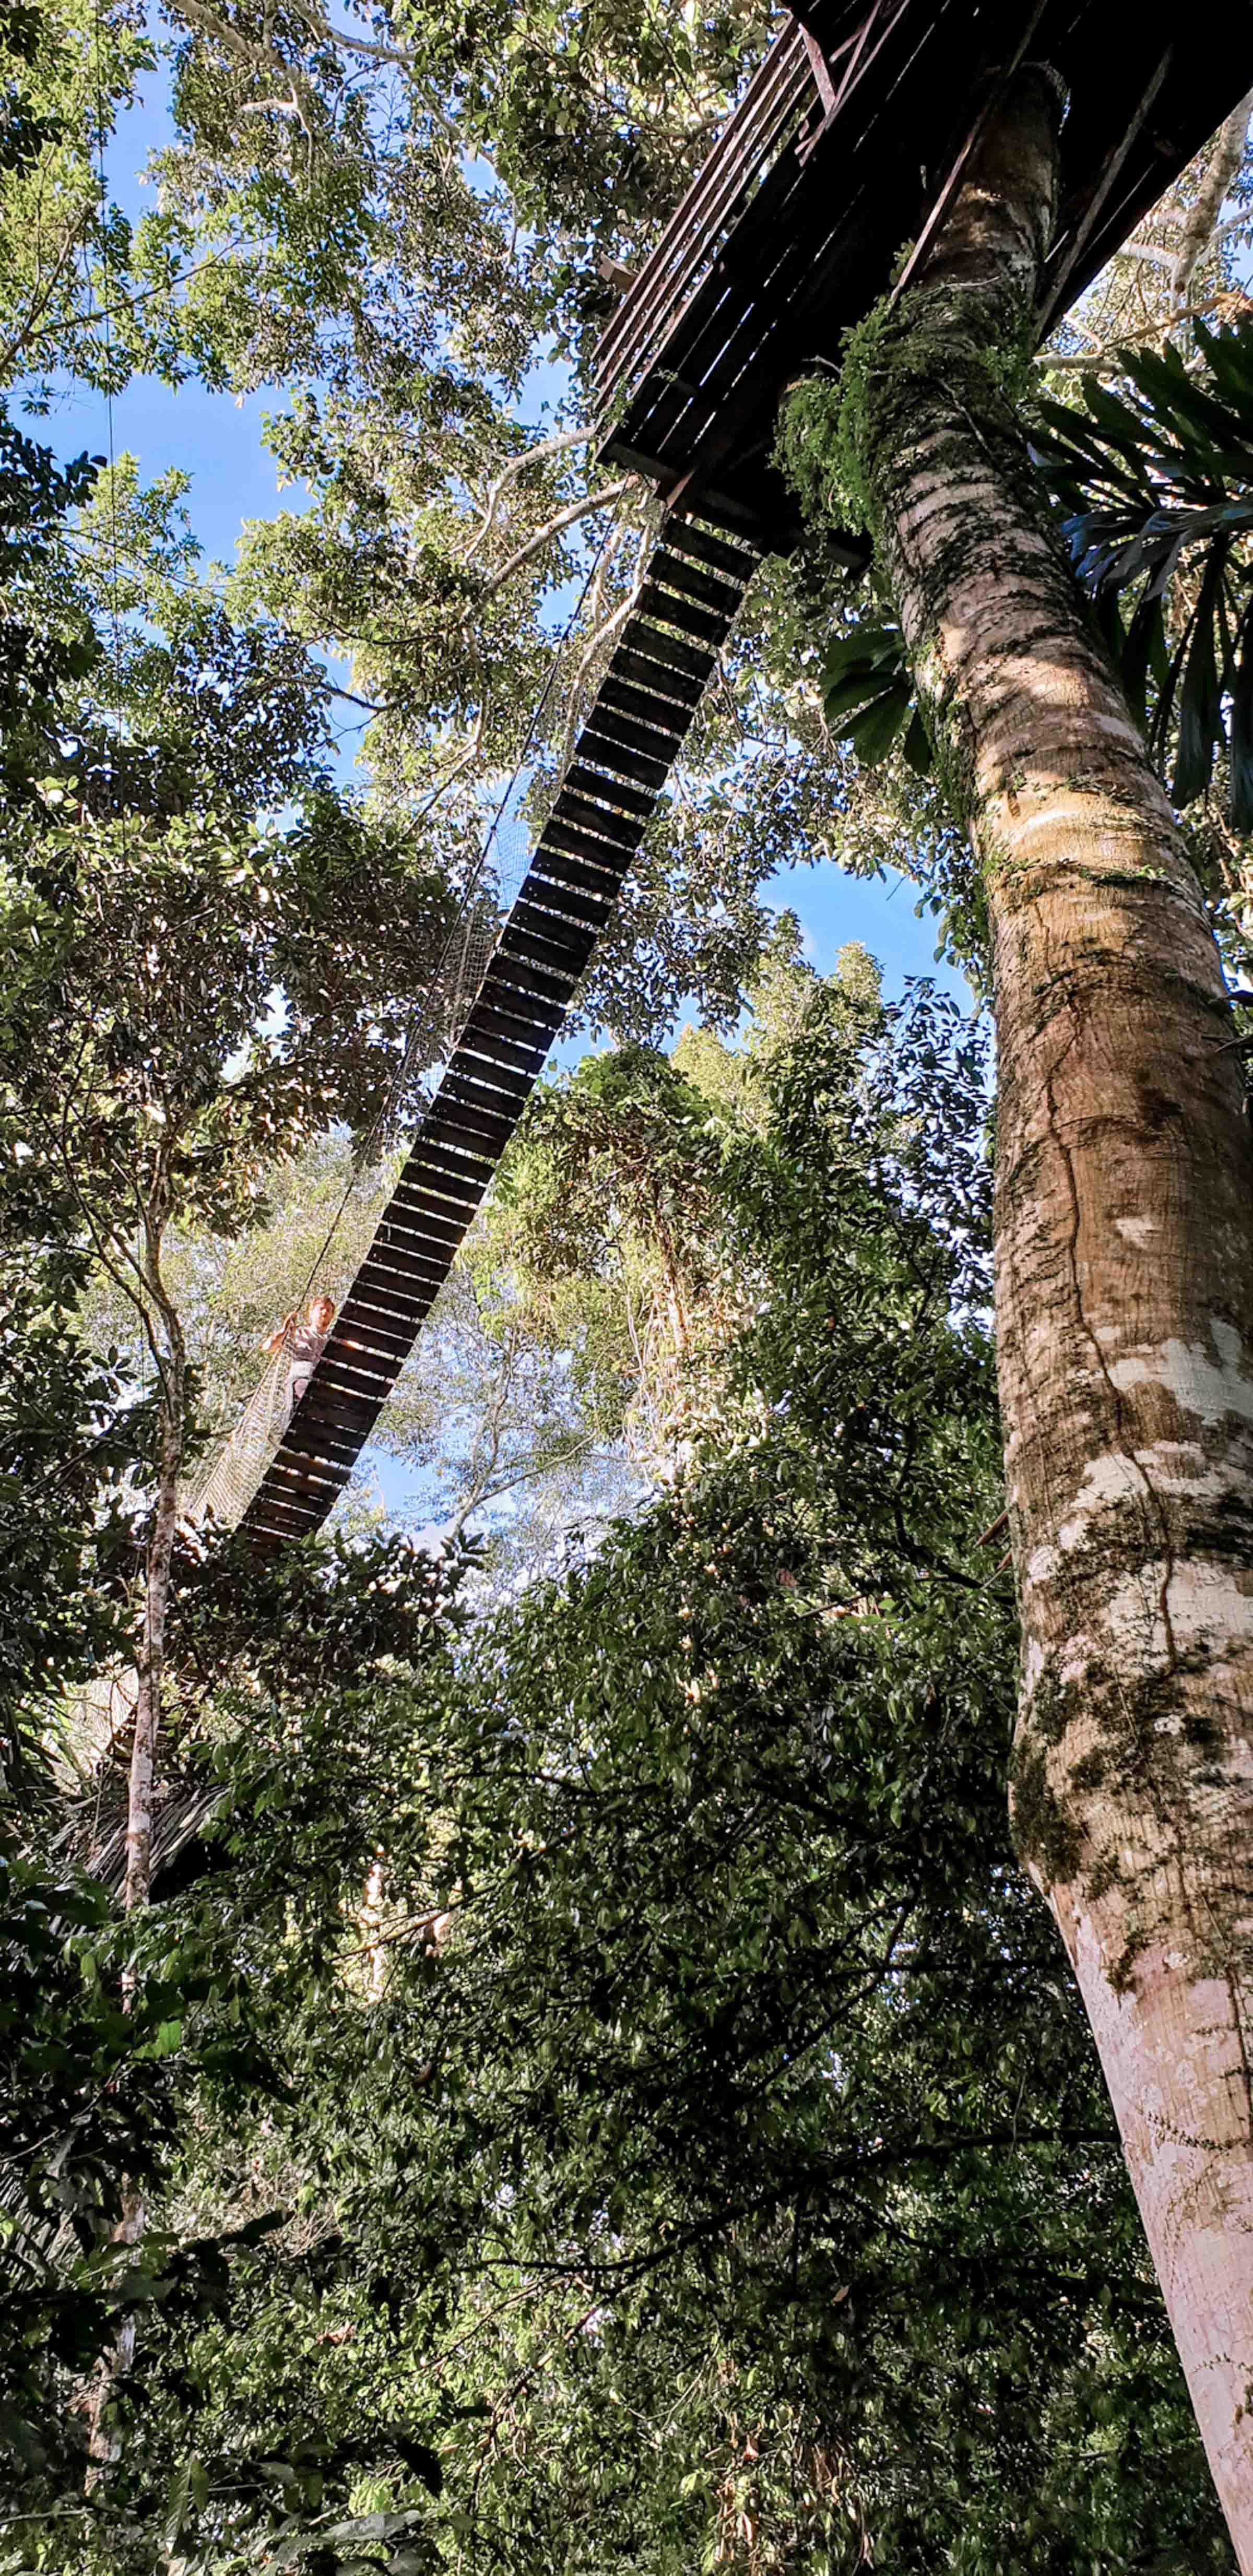 Hängende Brücken Dschungel Puerto Maldonado